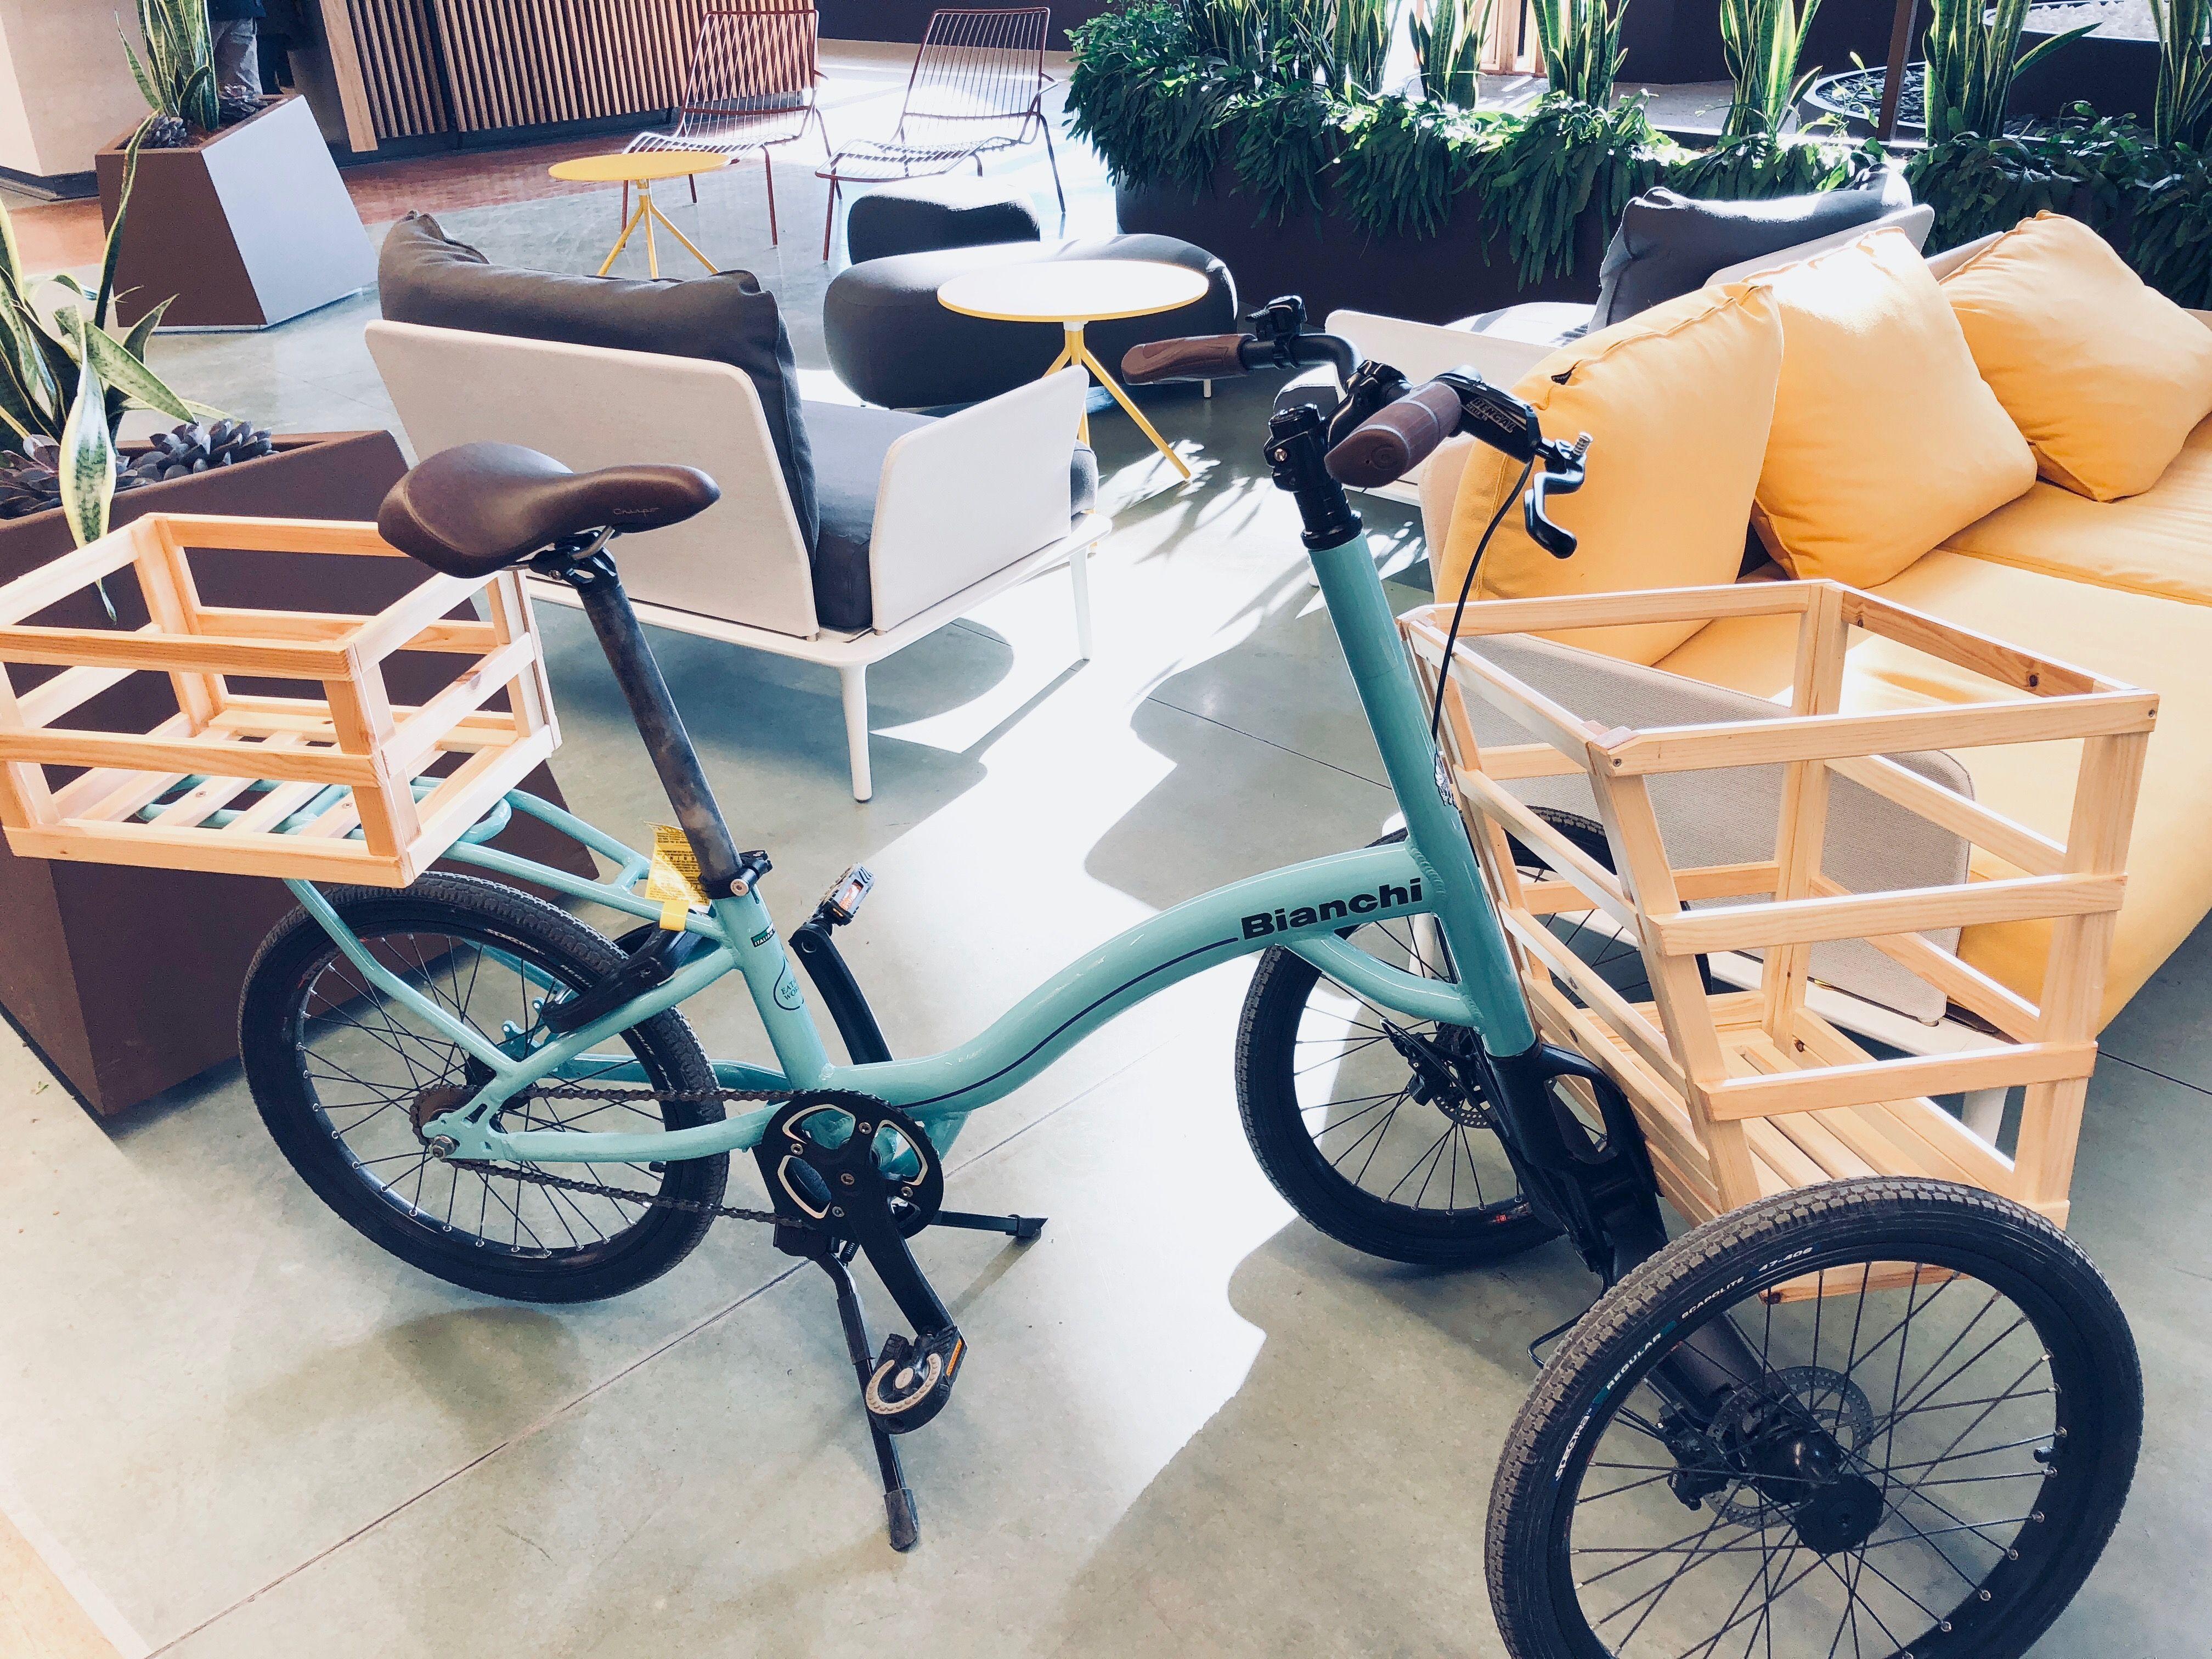 Bianchi Always Cargo Bikes Bicicletta E Cibo